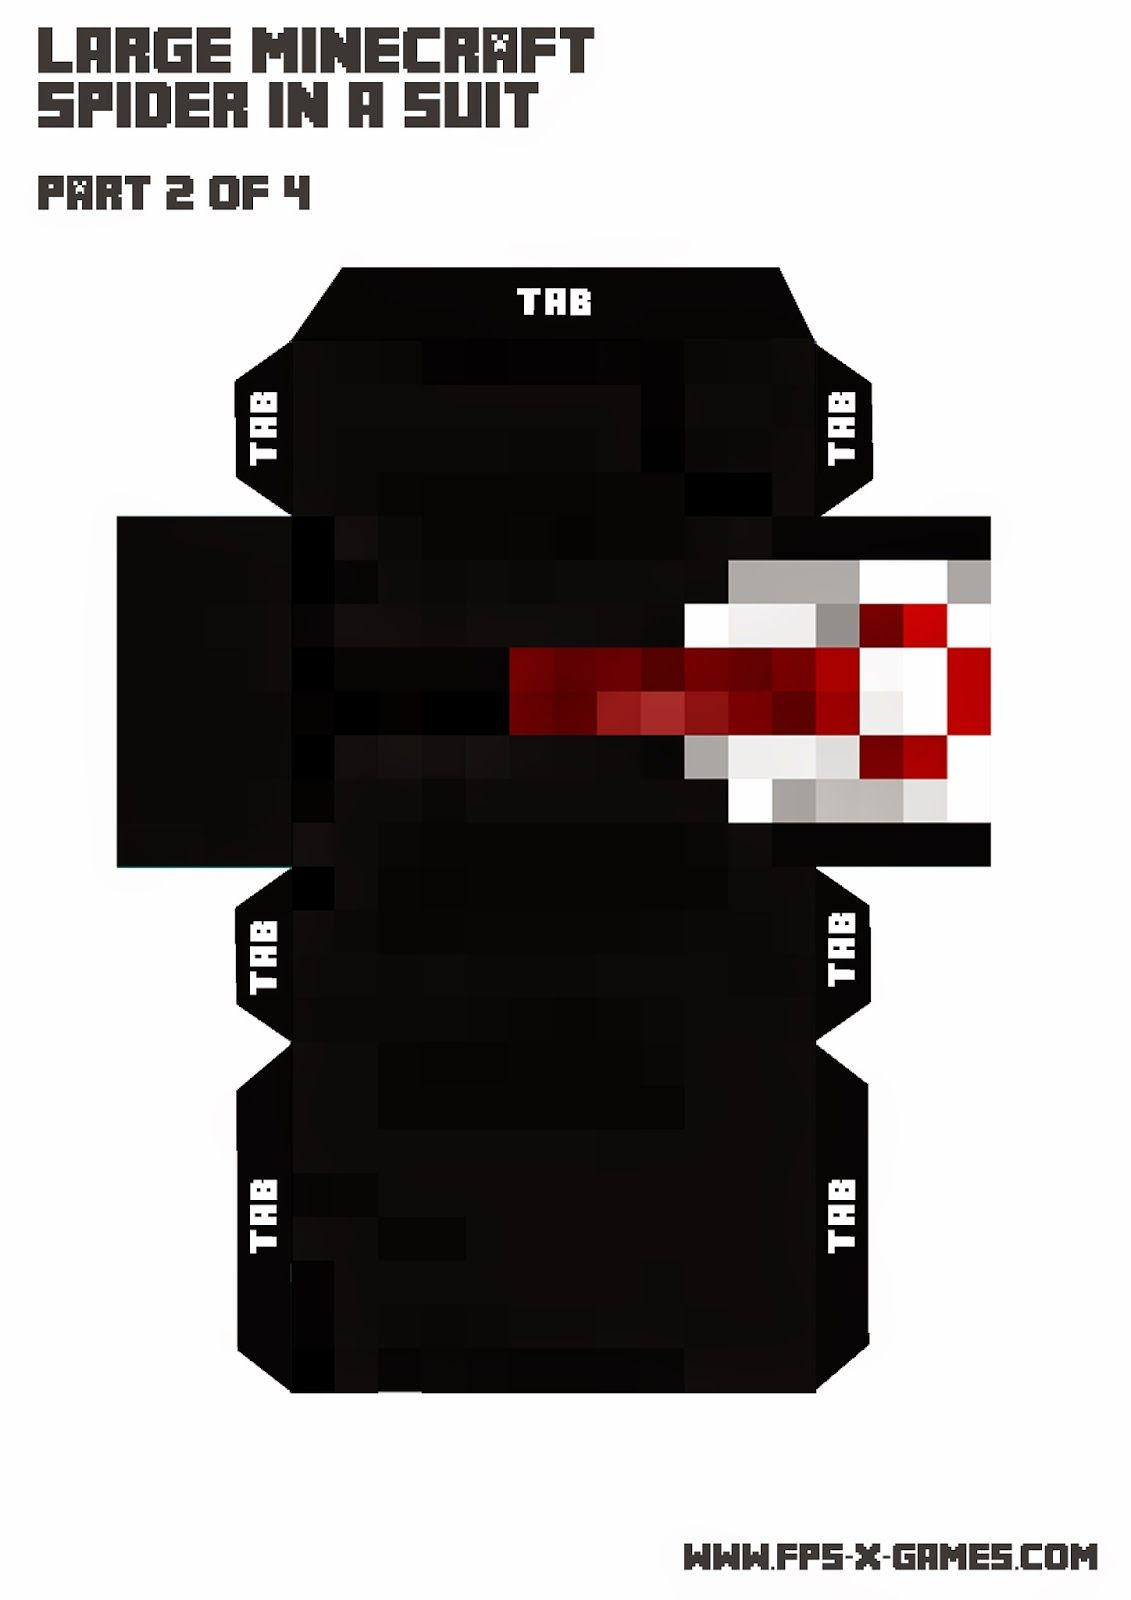 large-Minecraft-Spider-suit-papercraft-template-2-4.jpg 1,131×1,600 ...